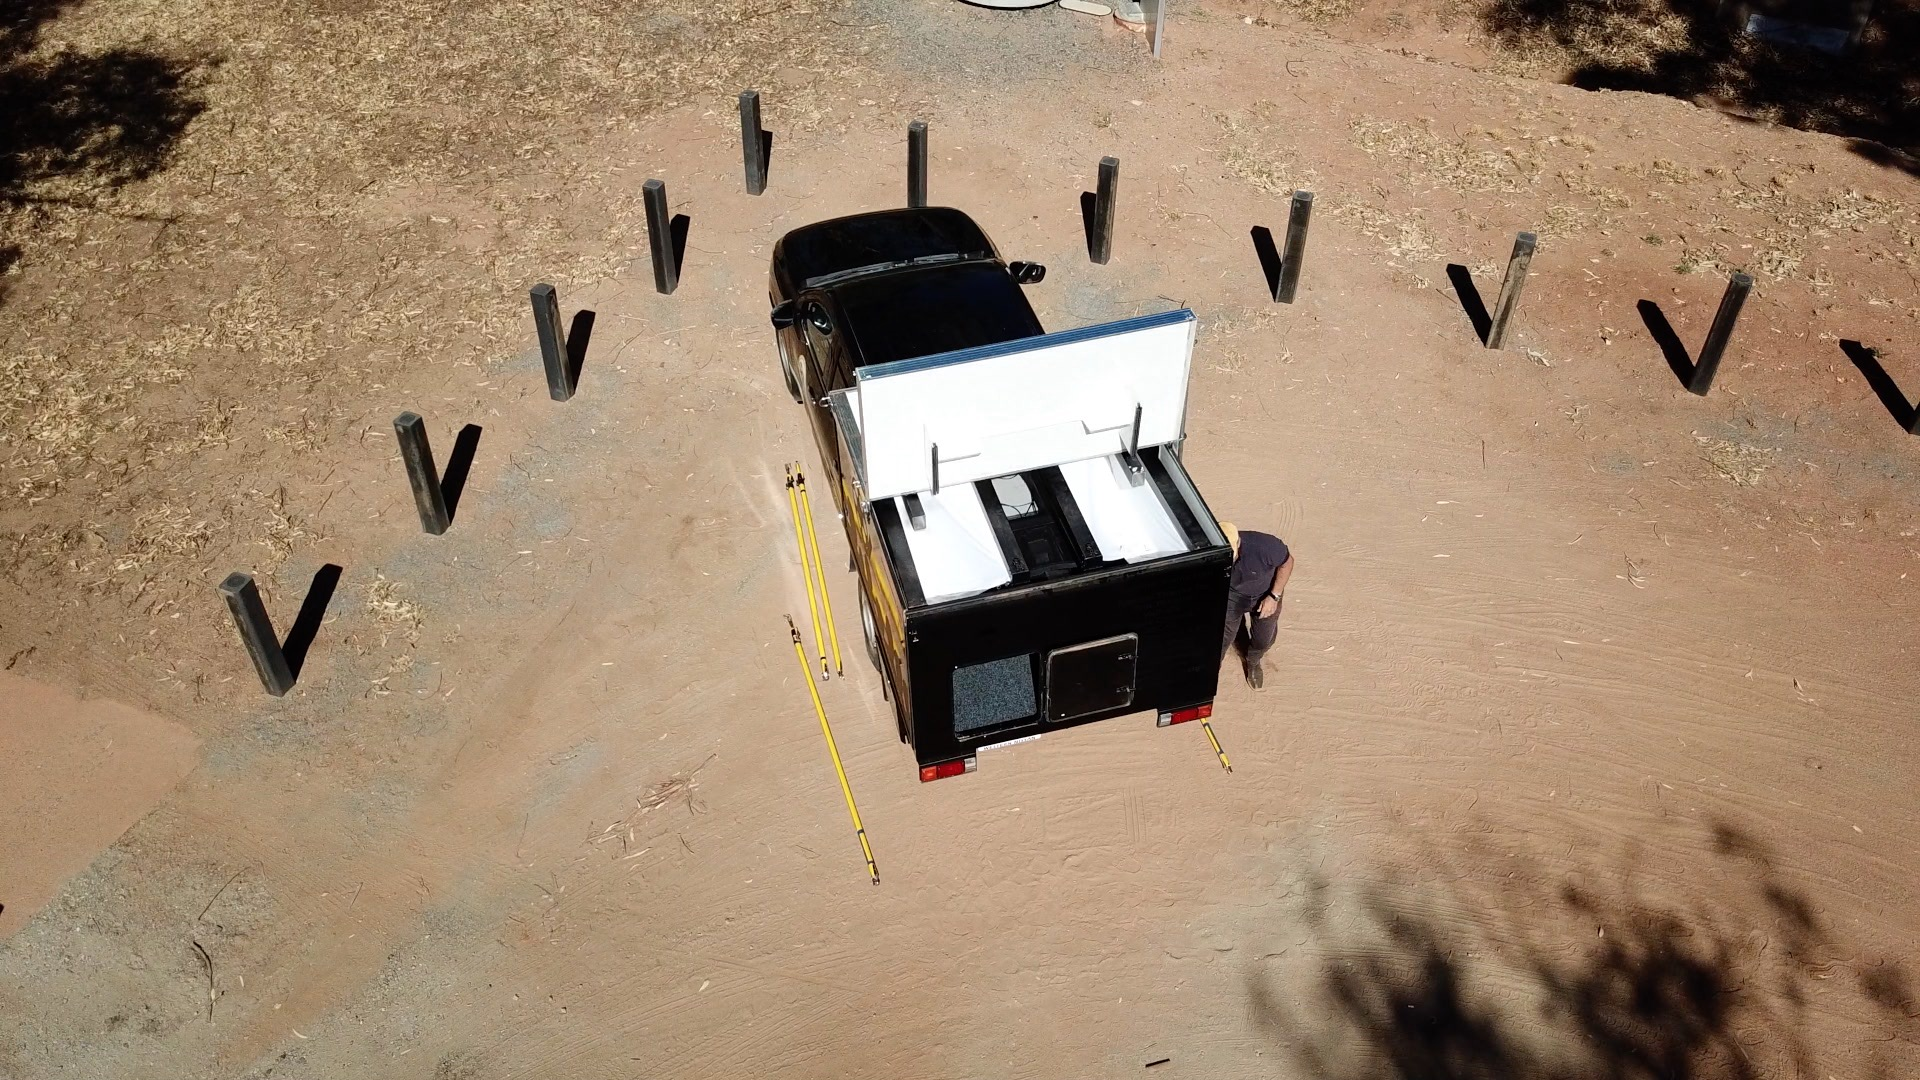 Truck unfolding 1.jpg